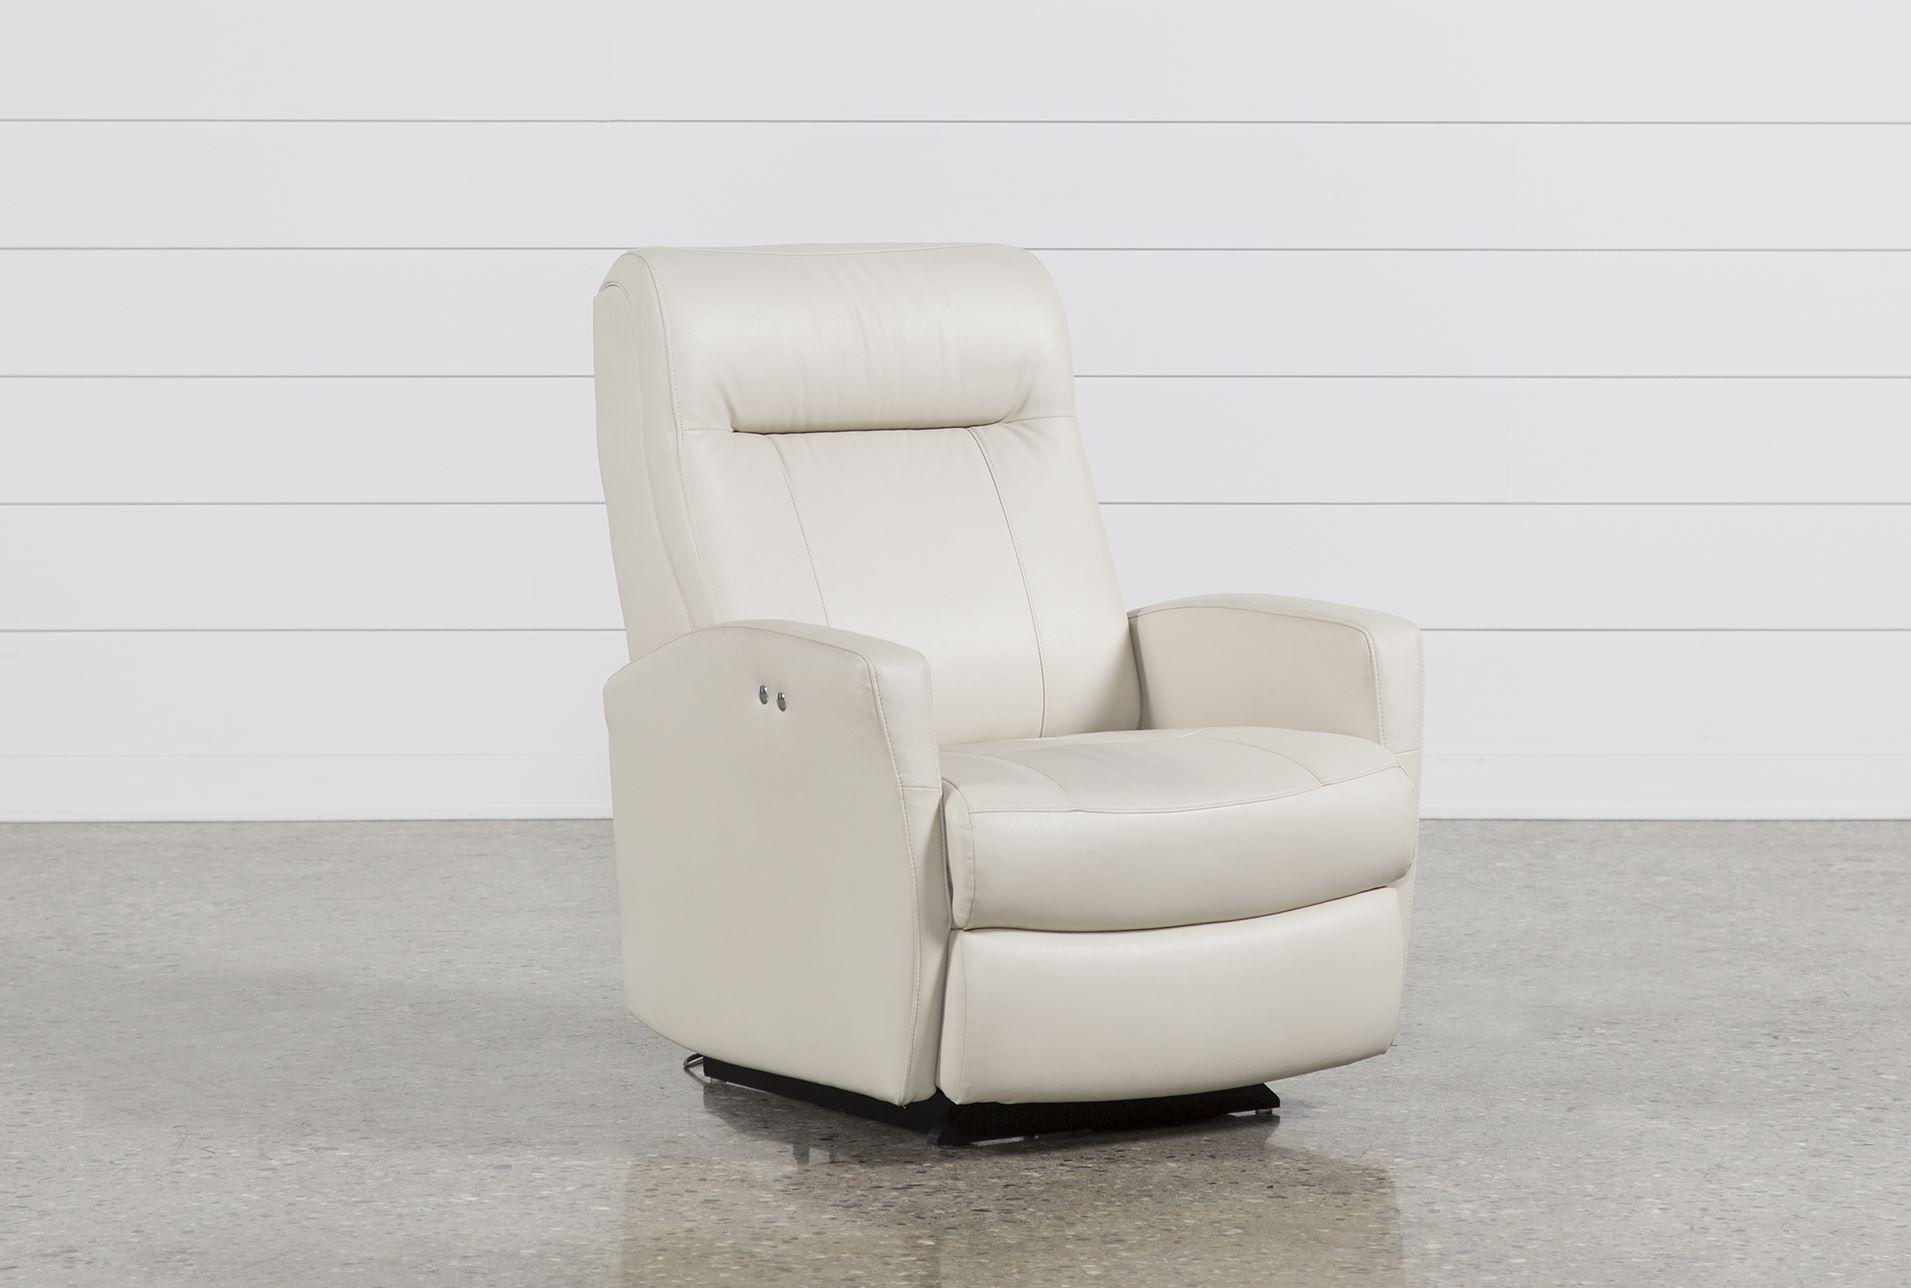 Dale Ii Power Rocker Recliner Living Spaces With Images Recliner Living Furniture Rocker Recliners